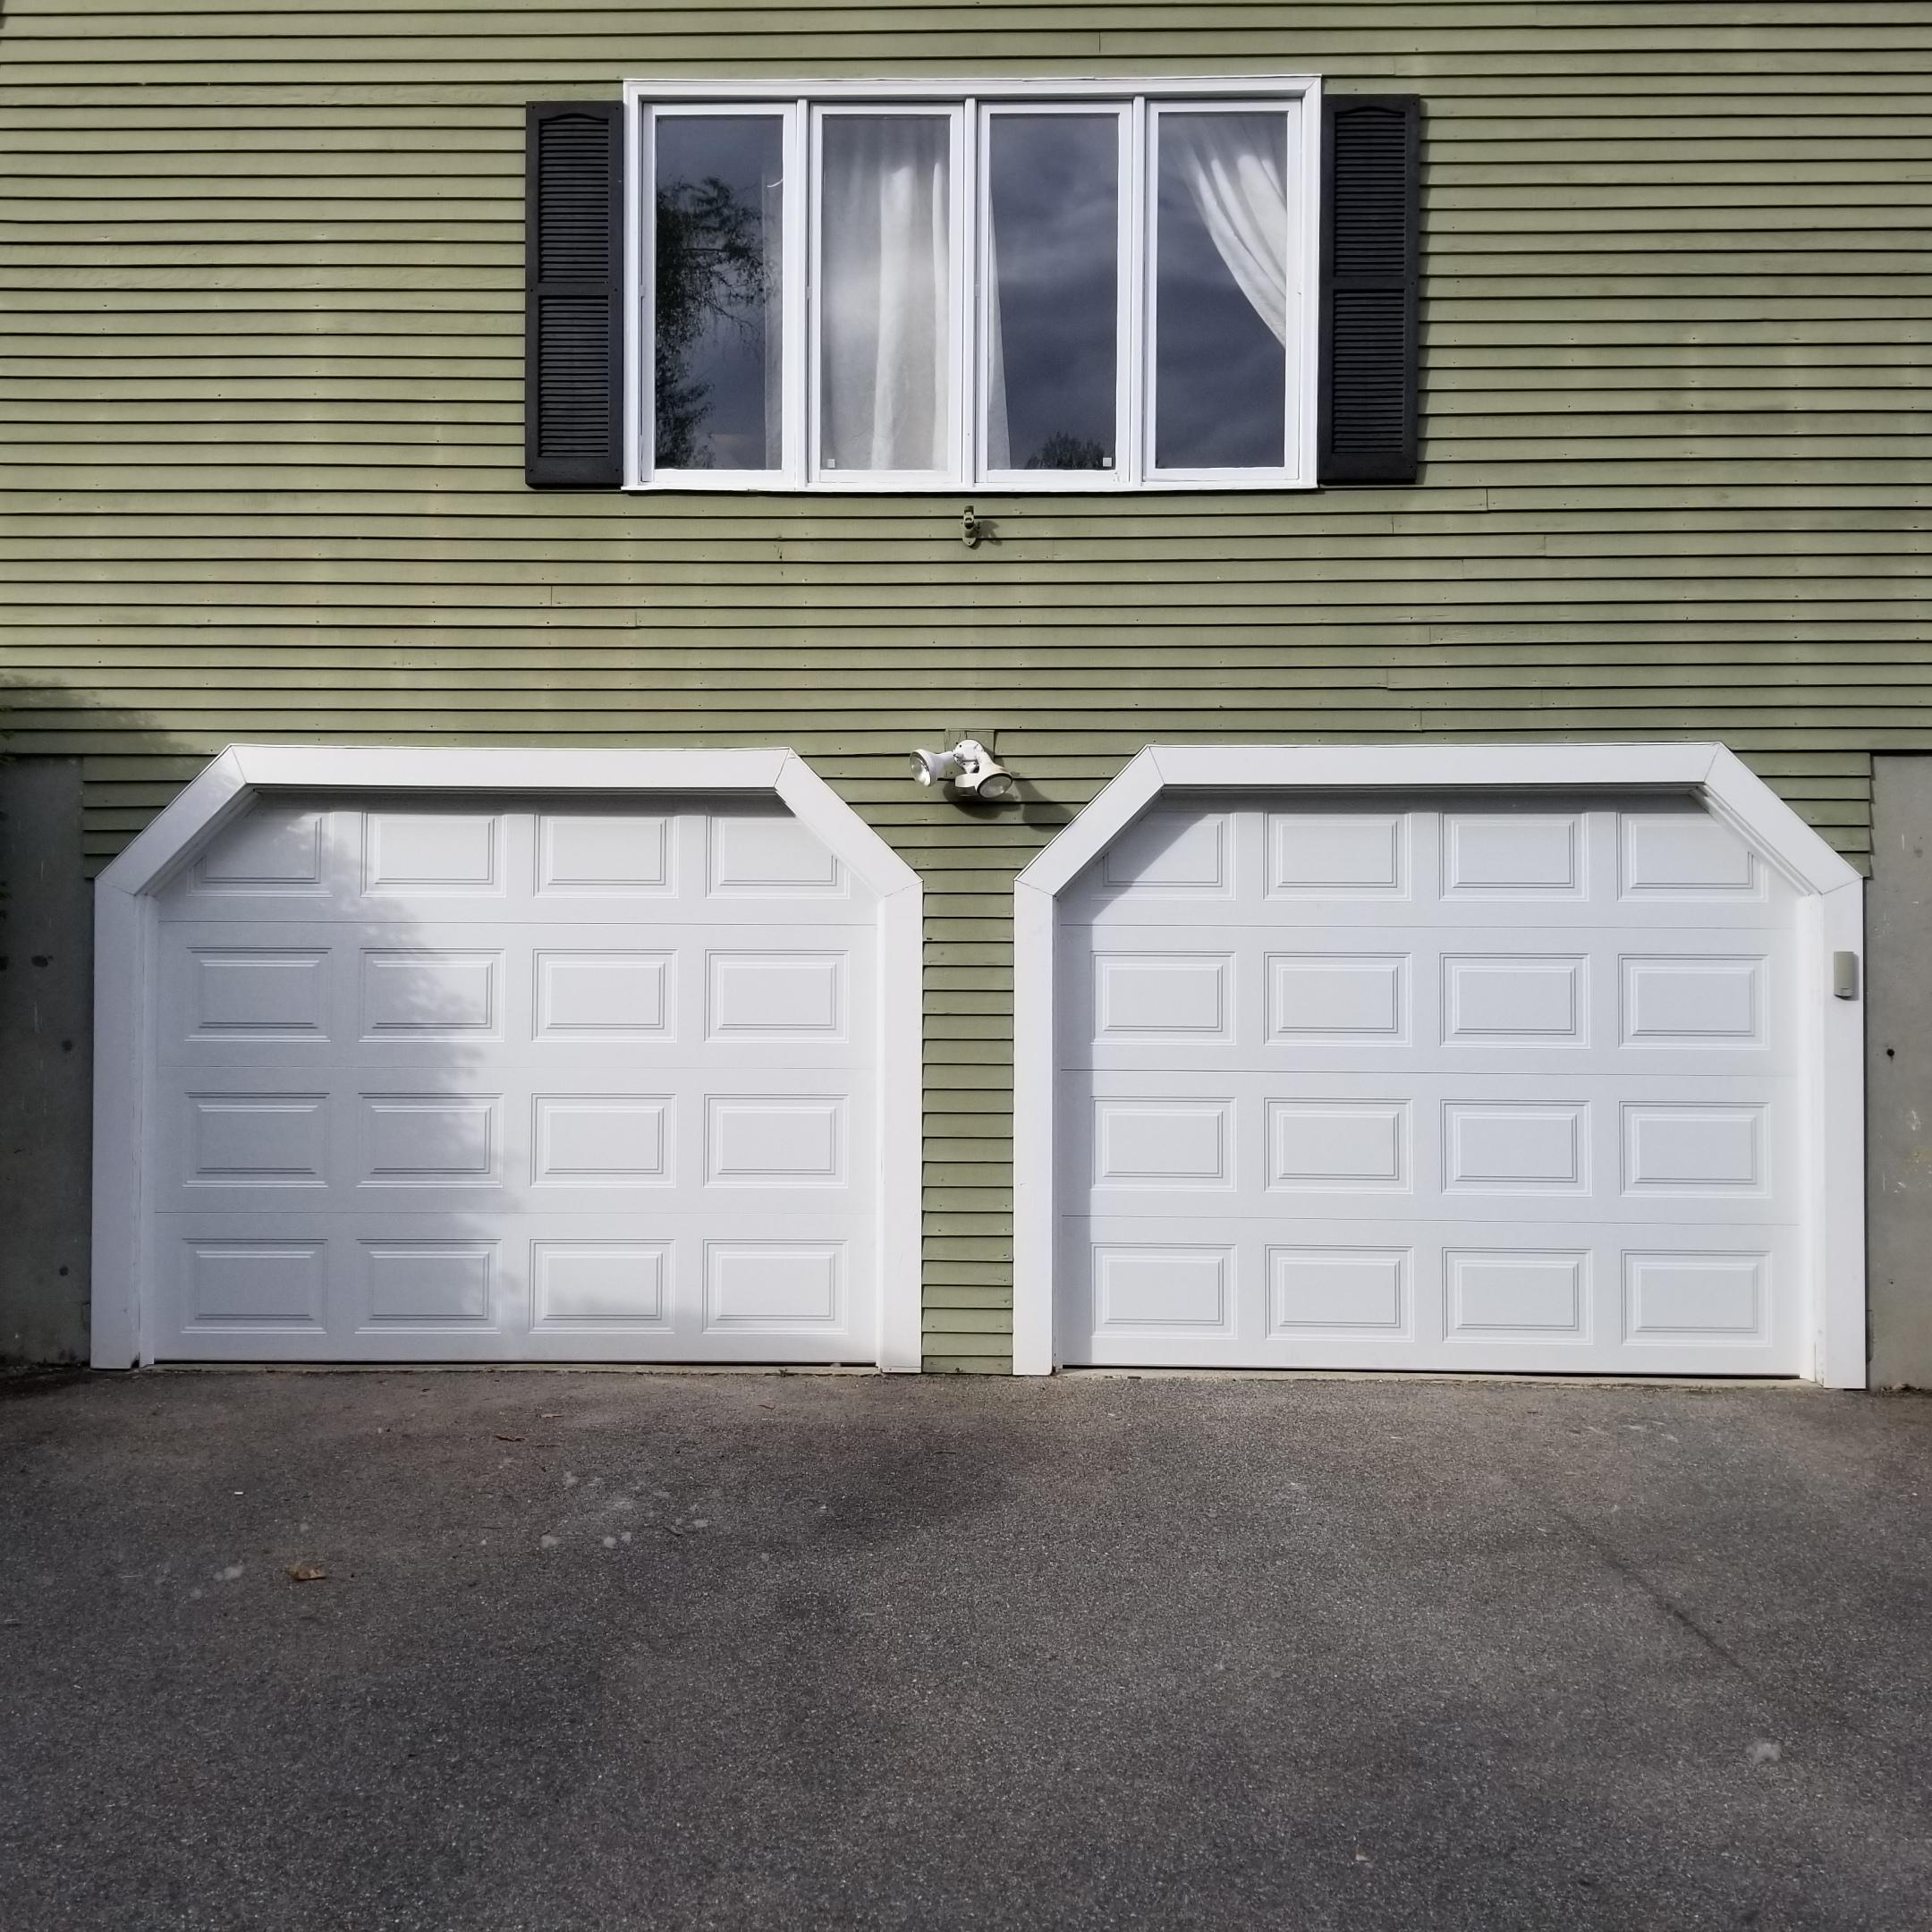 Mass Garage Doors Expert image 6